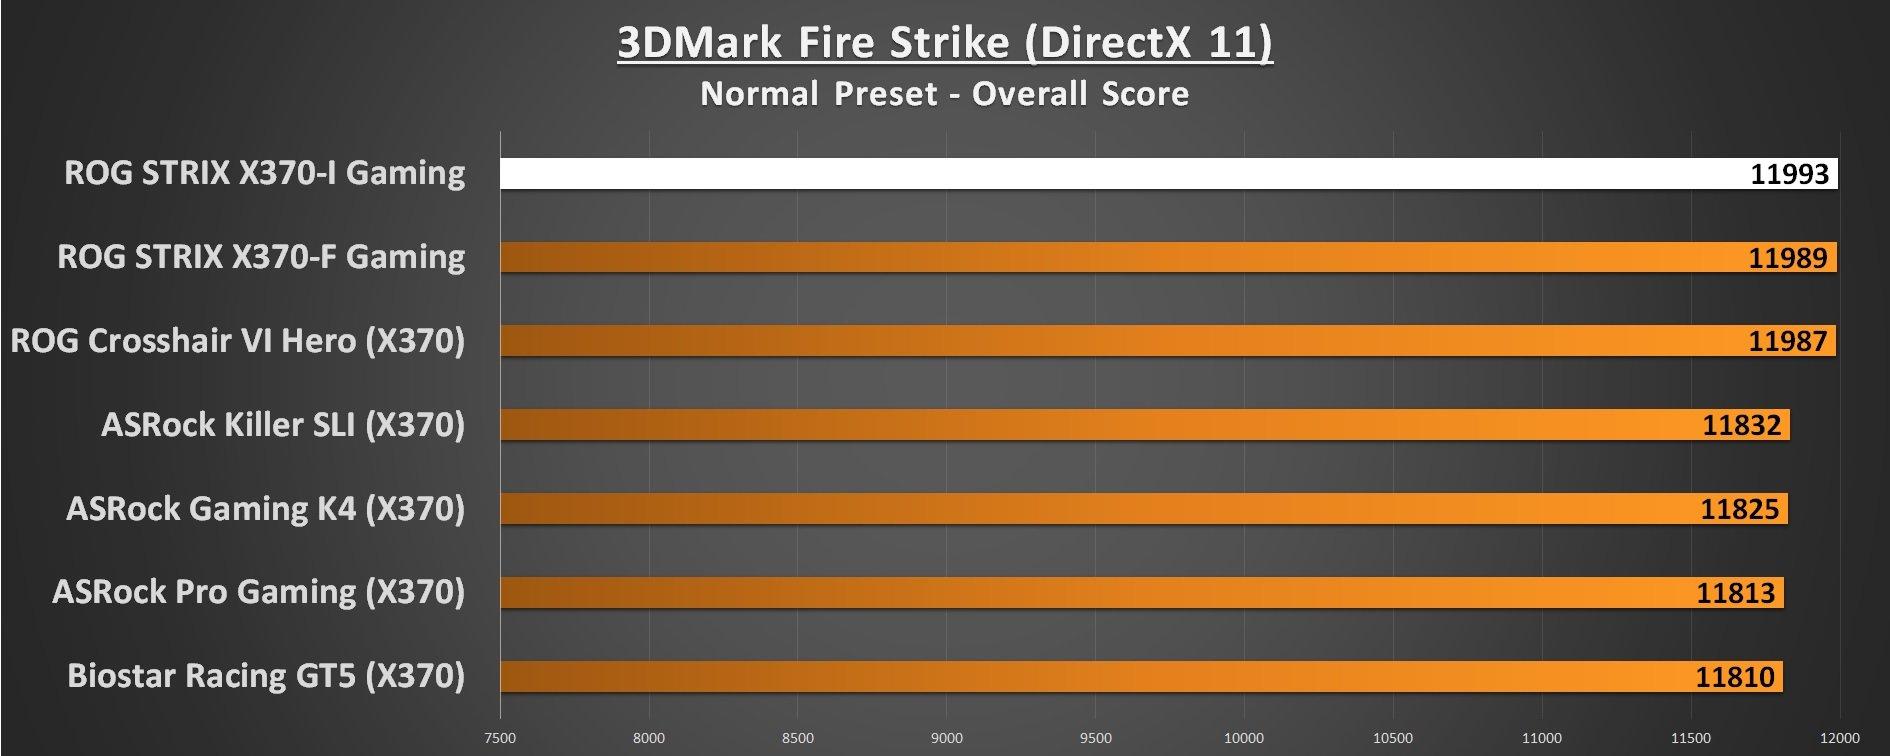 ASUS ROG STRIX X370-I Performance 3DMark Fire Strike